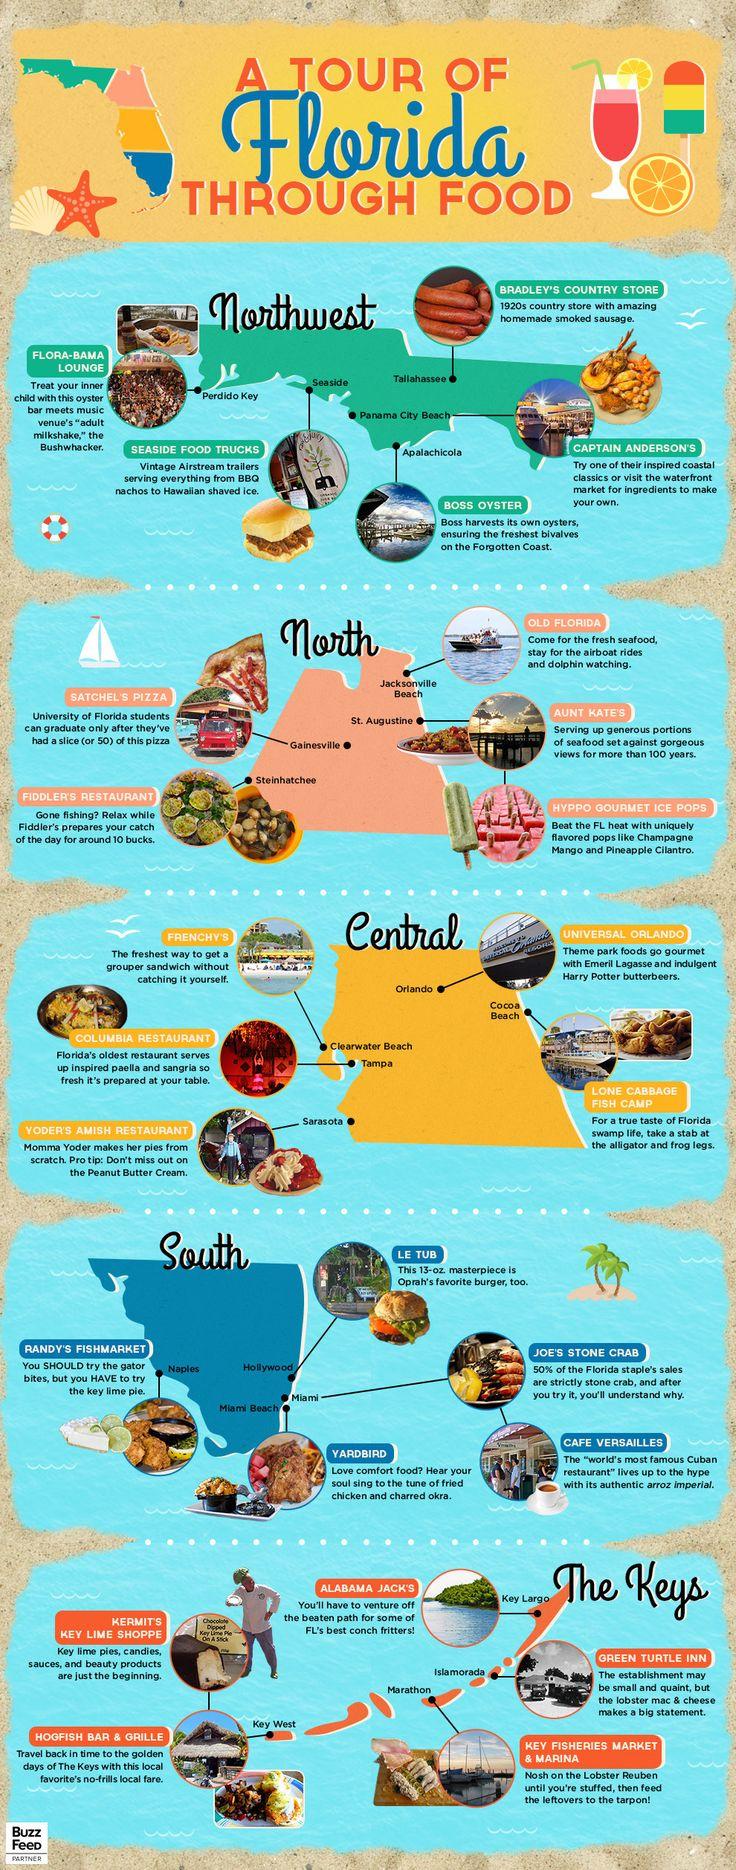 A Tour Of Florida Through Food. Don't miss Oprah's favorite burger in Miami…